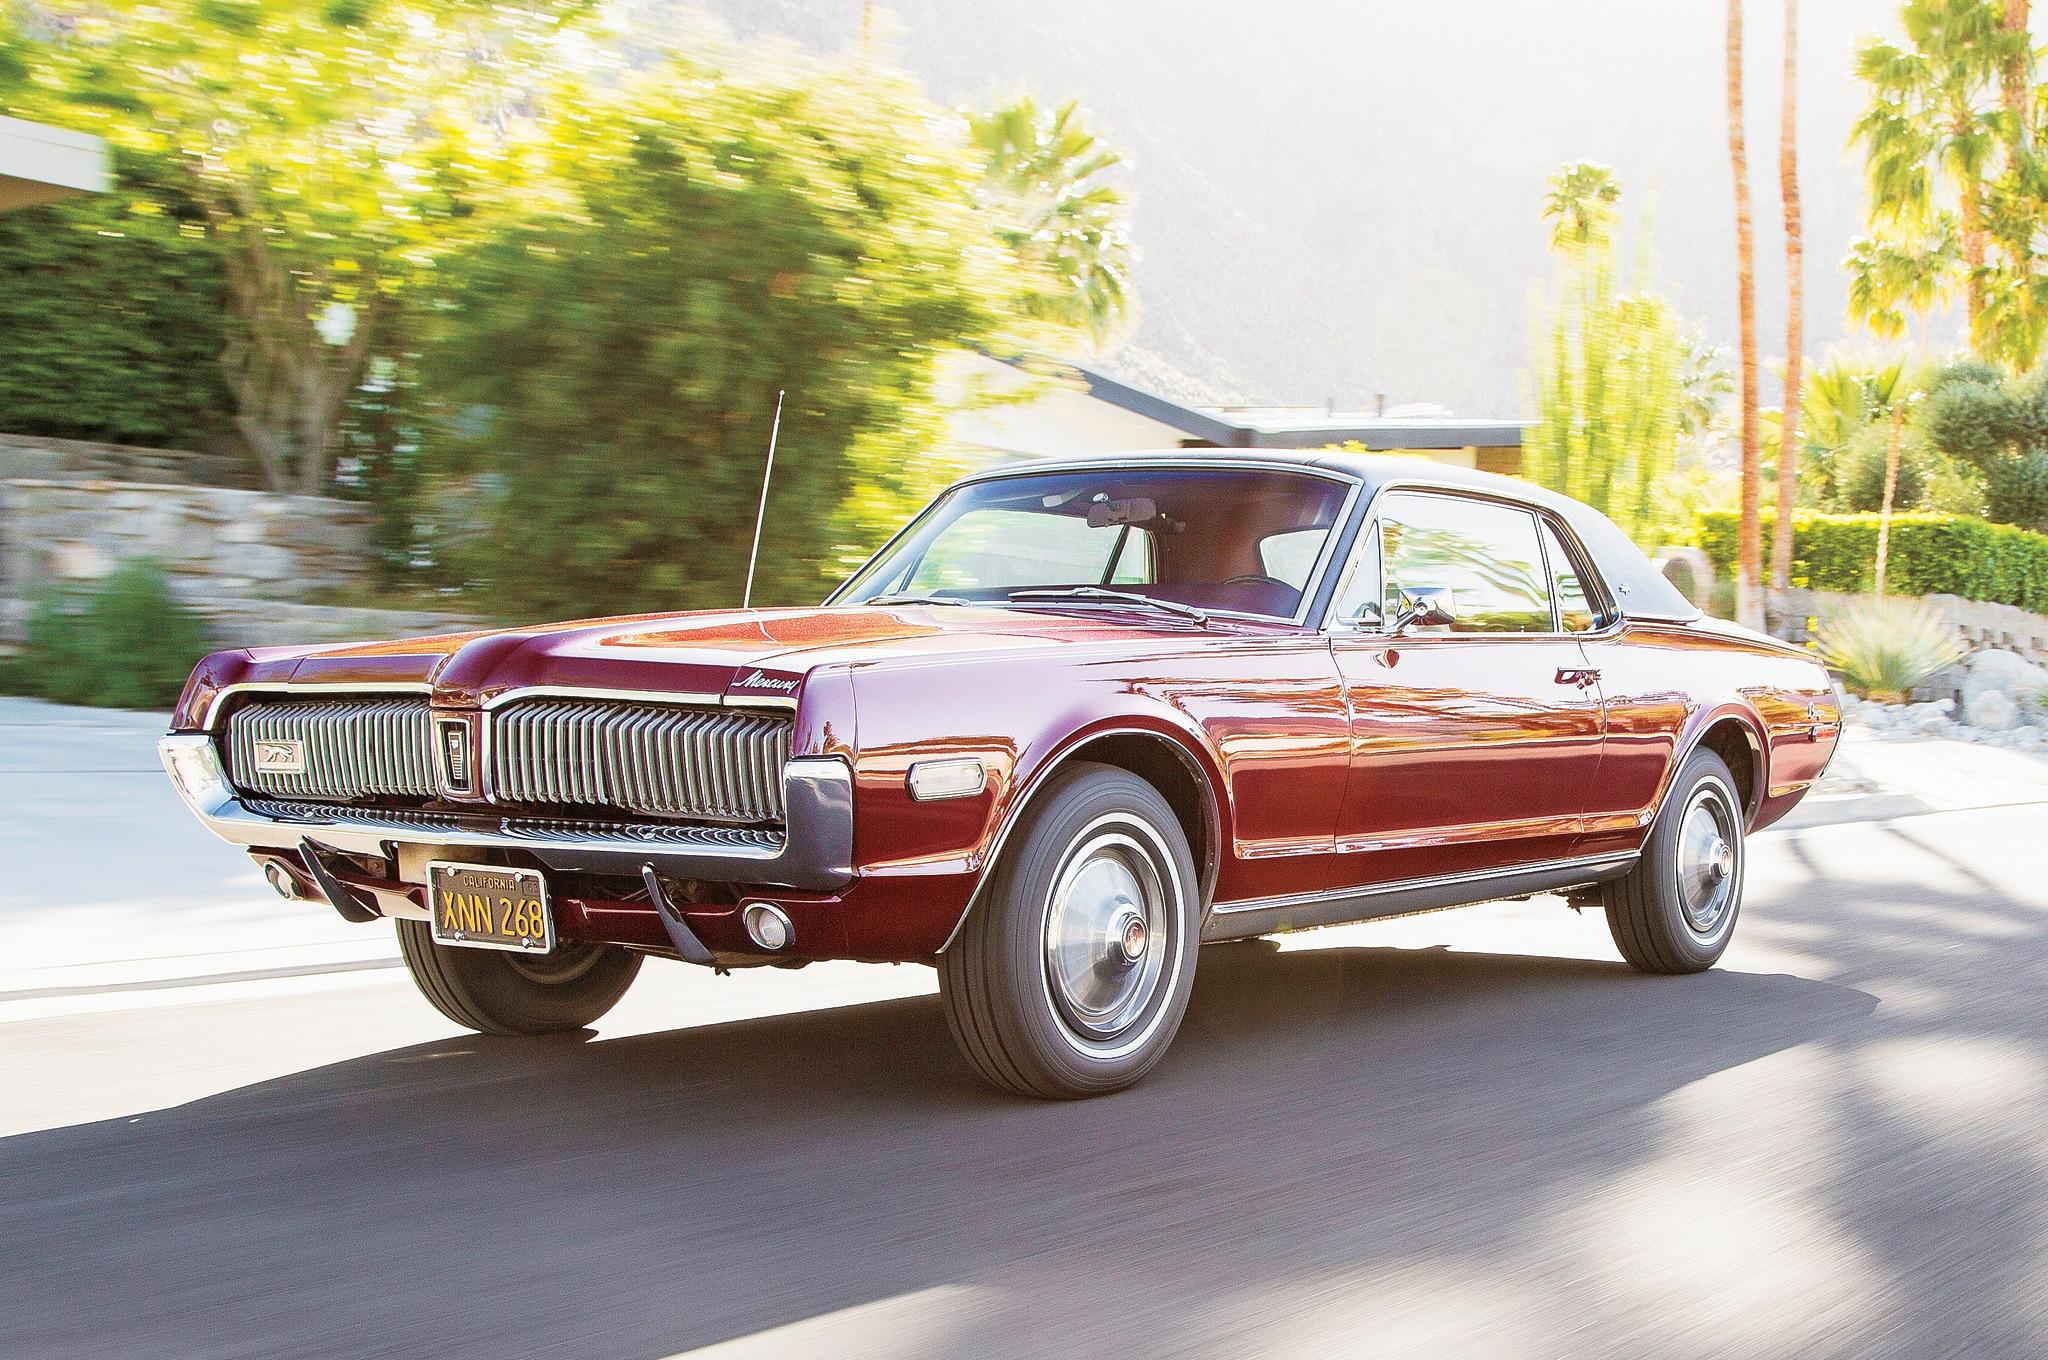 1967 1968 Mercury Cougar Front Three Quarter In Motion